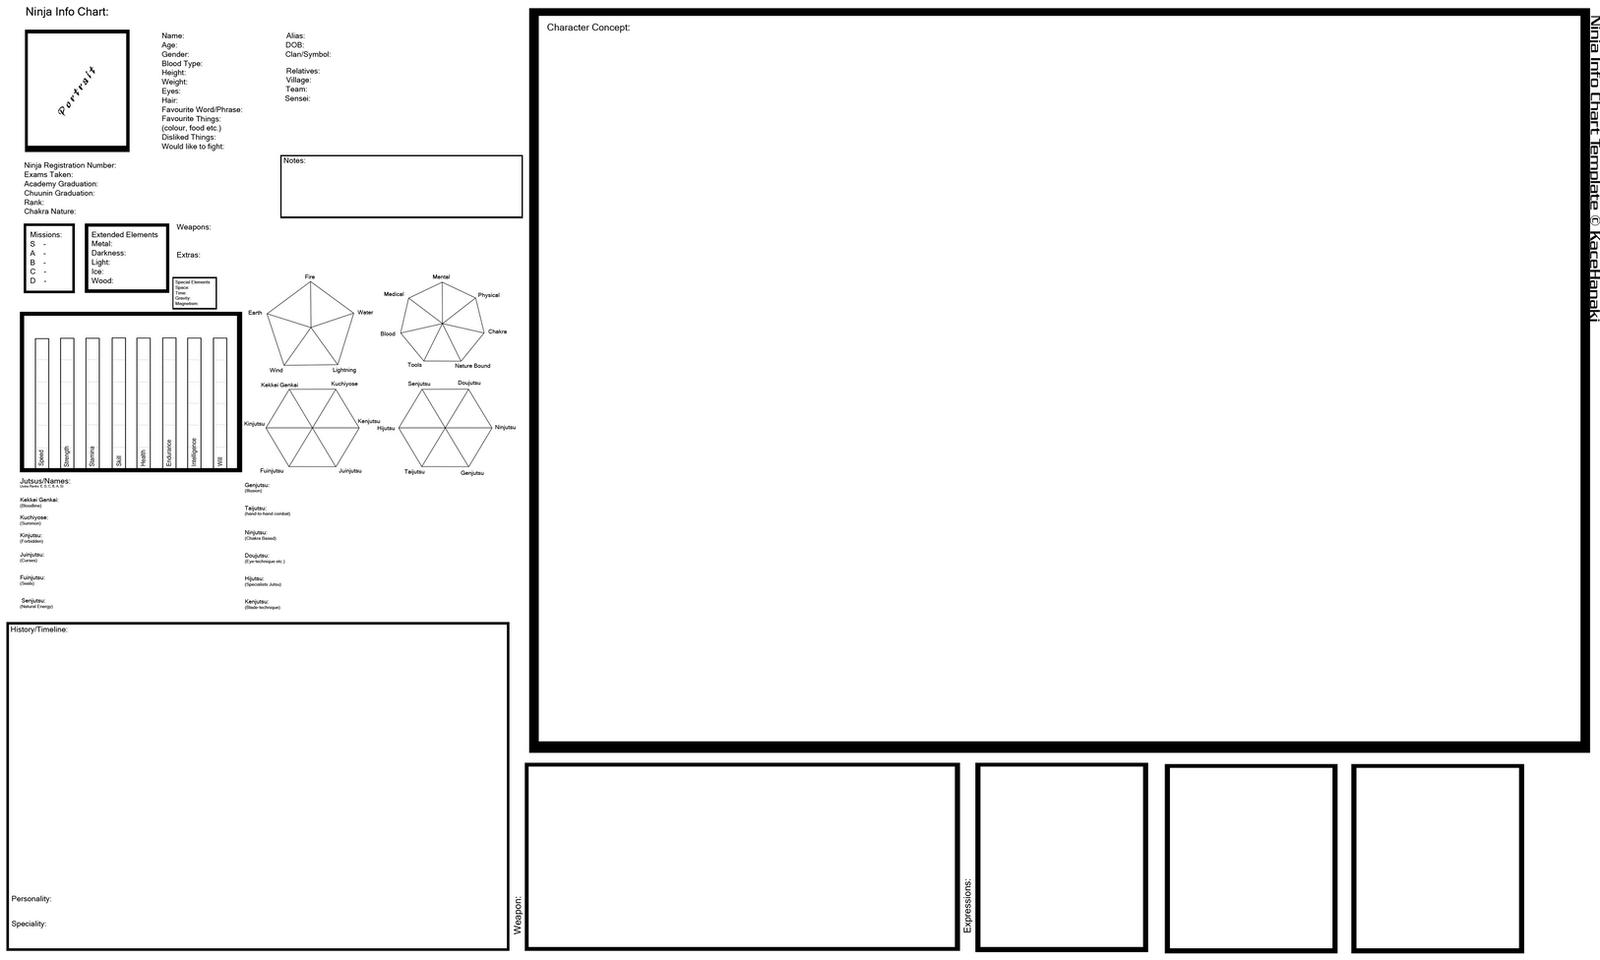 Anime Character Design Template : Ninja info chart template by suspiria ru on deviantart